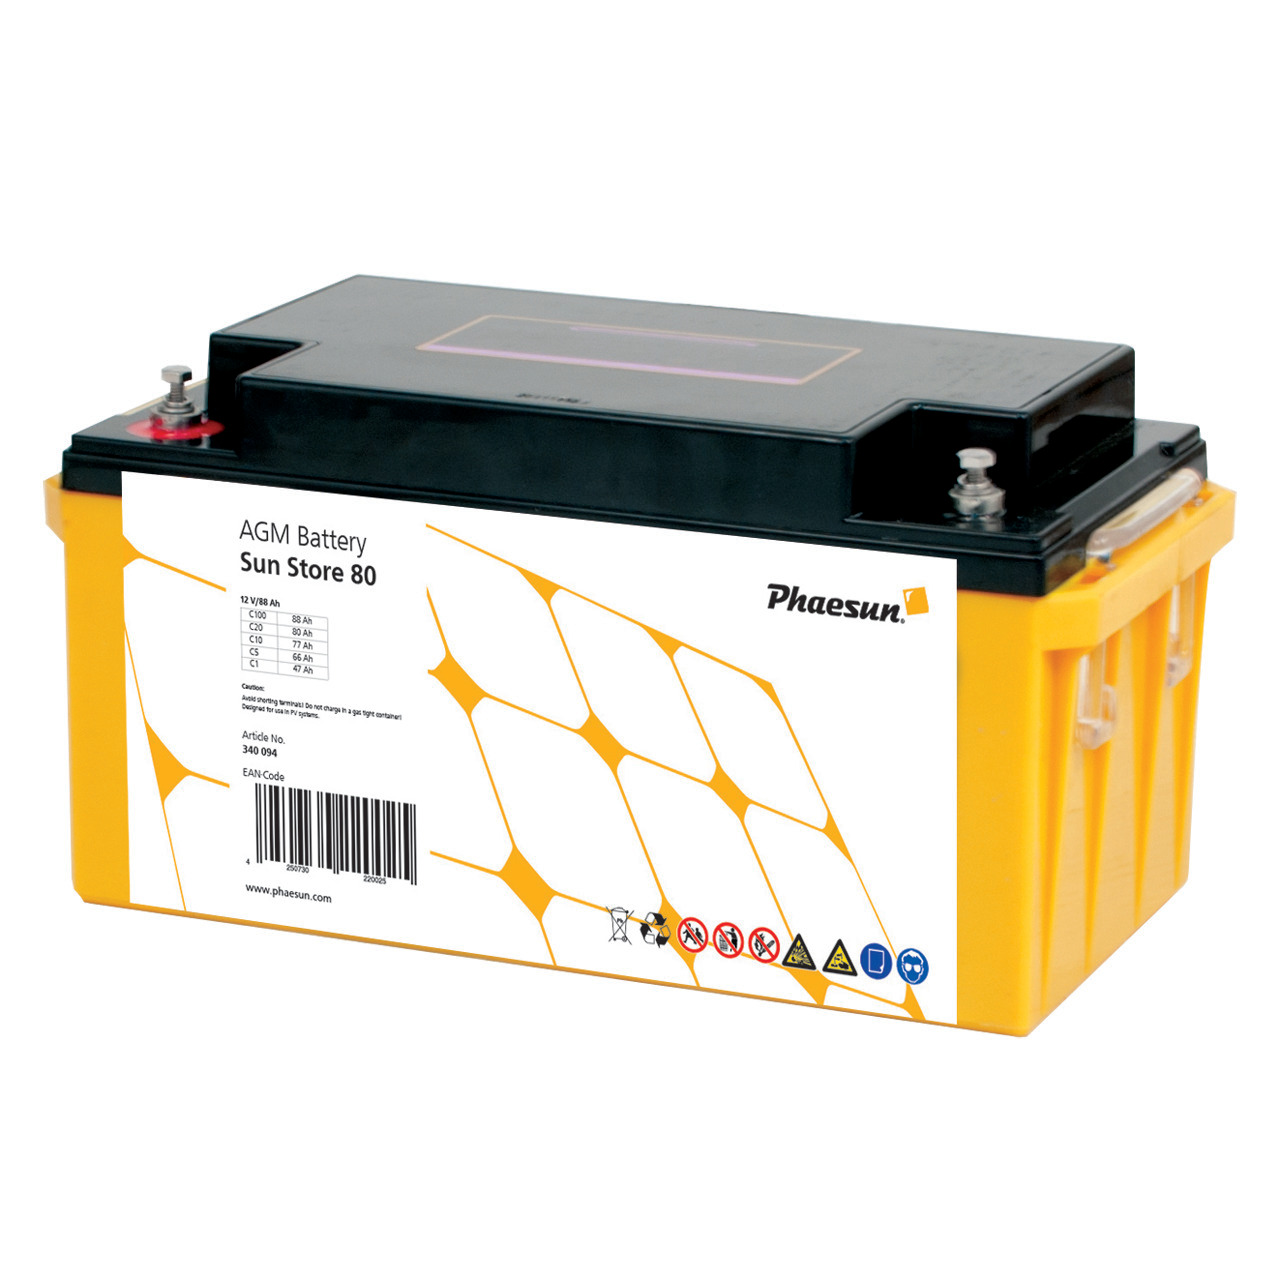 Phaesun Blei-AGM-Akku Sun Store 80- 12 V- 80 Ah